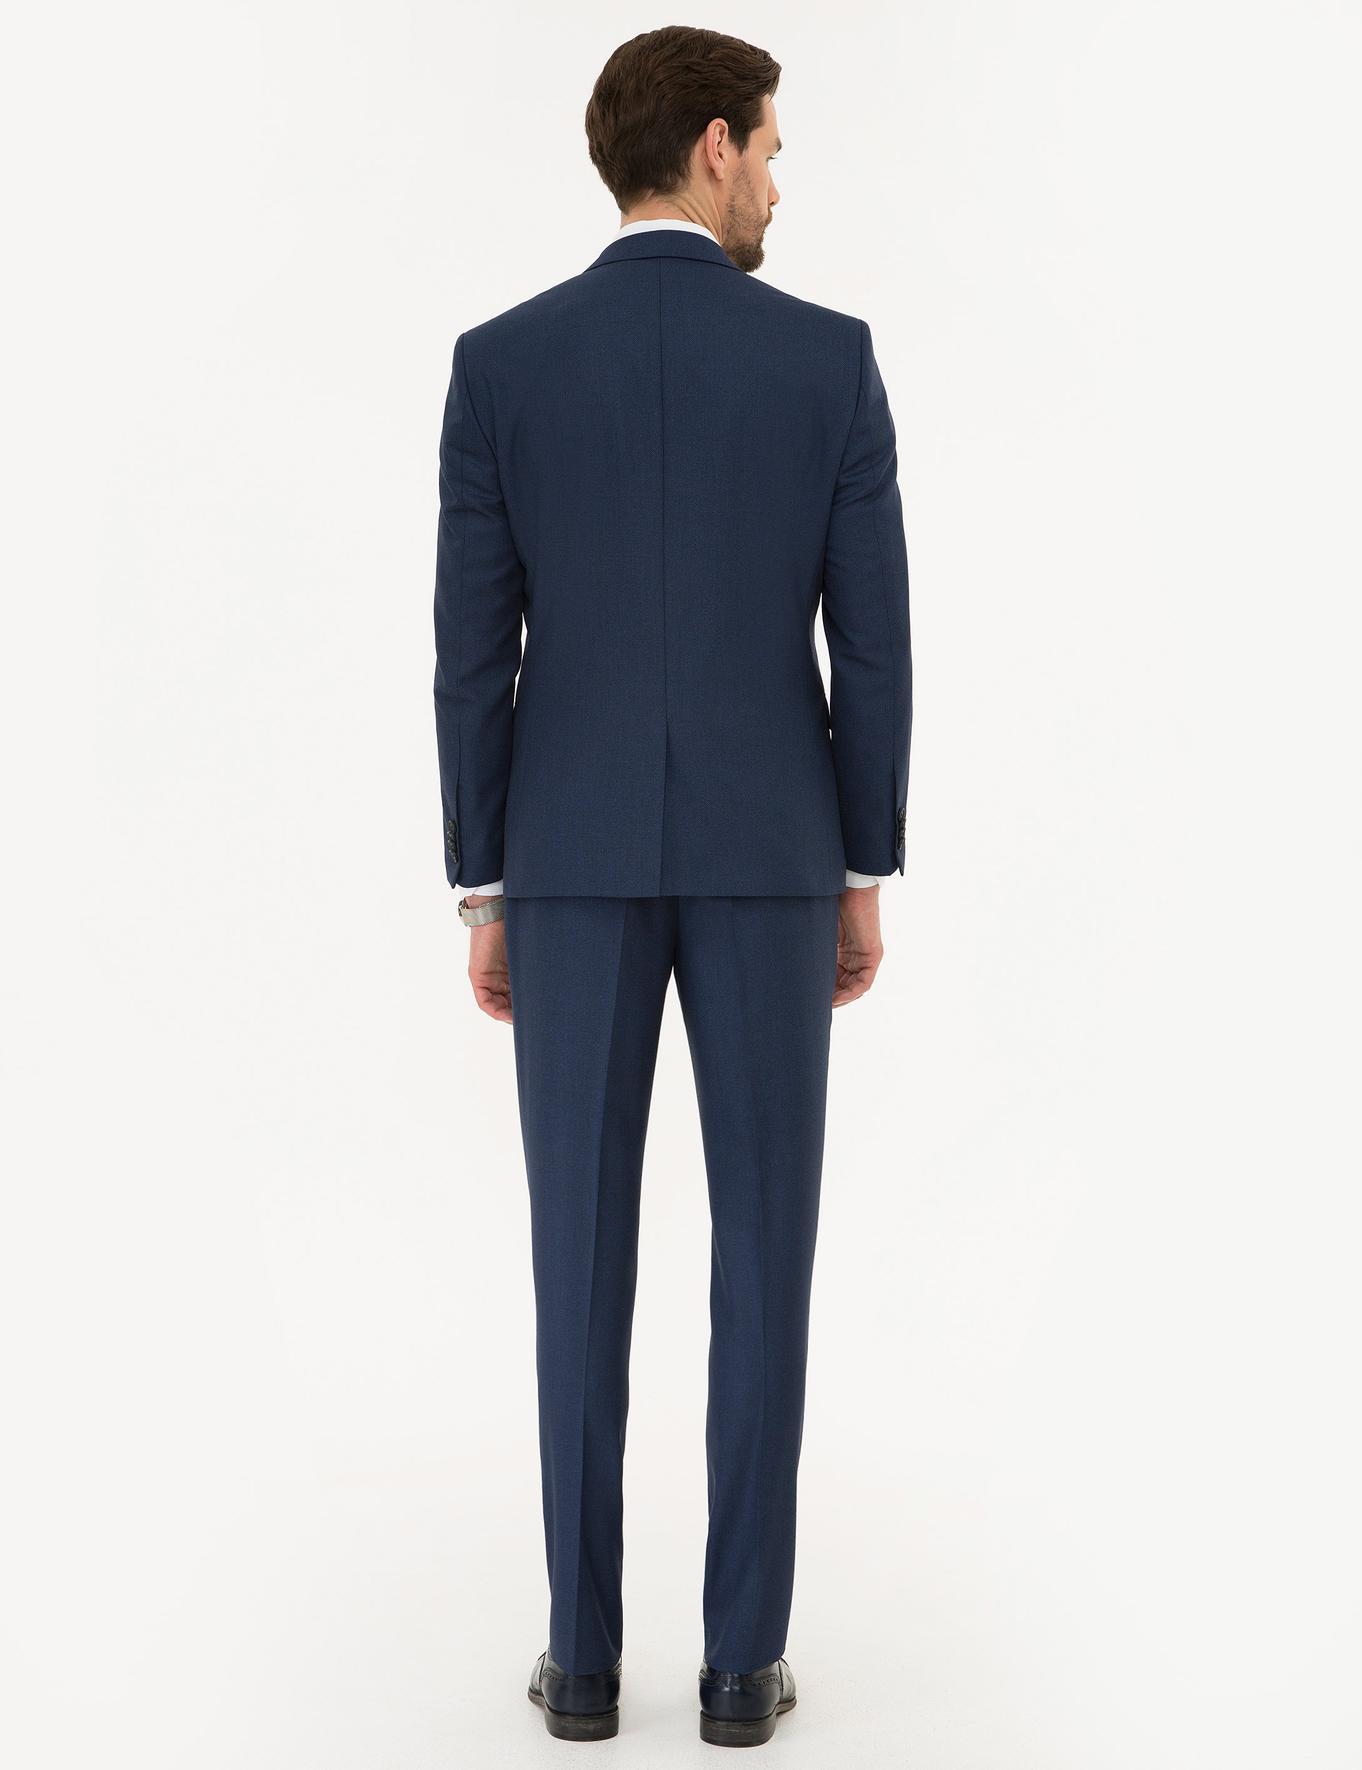 Açık Lacivert Slim Fit Takım Elbise